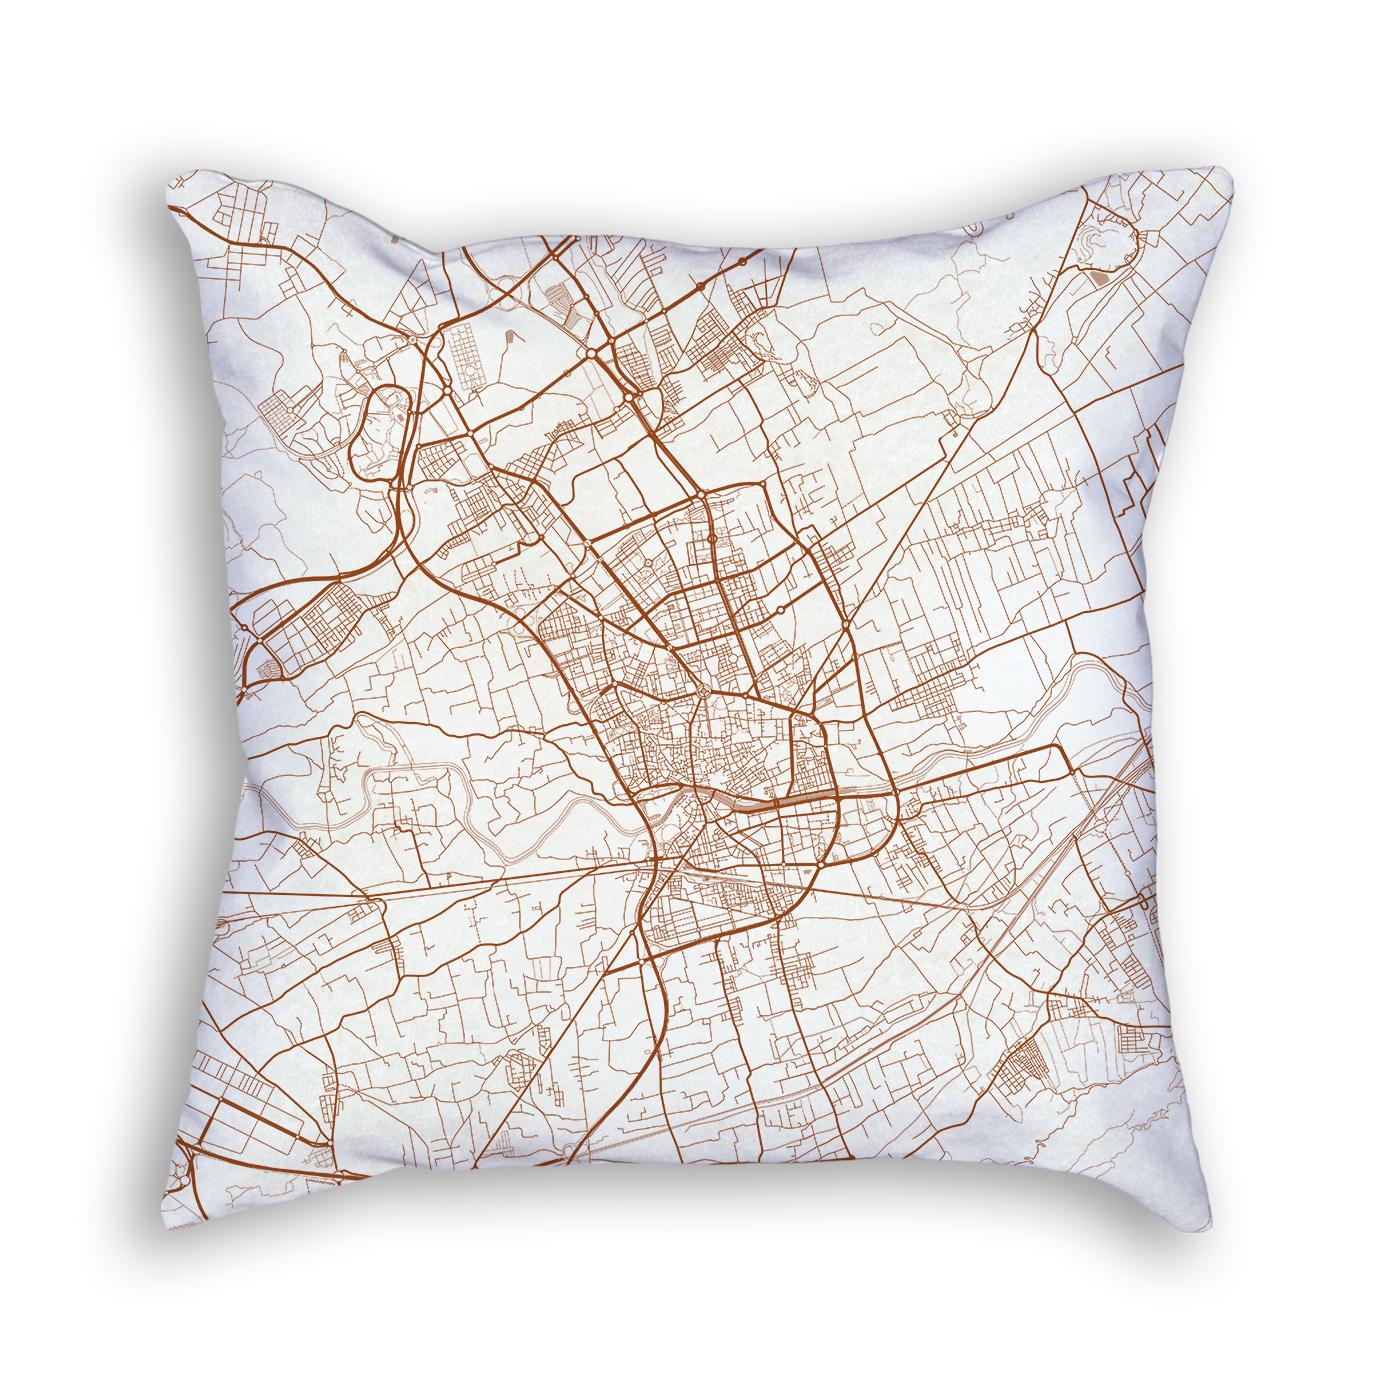 Murcia Spain City Map Art Decorative Throw Pillow